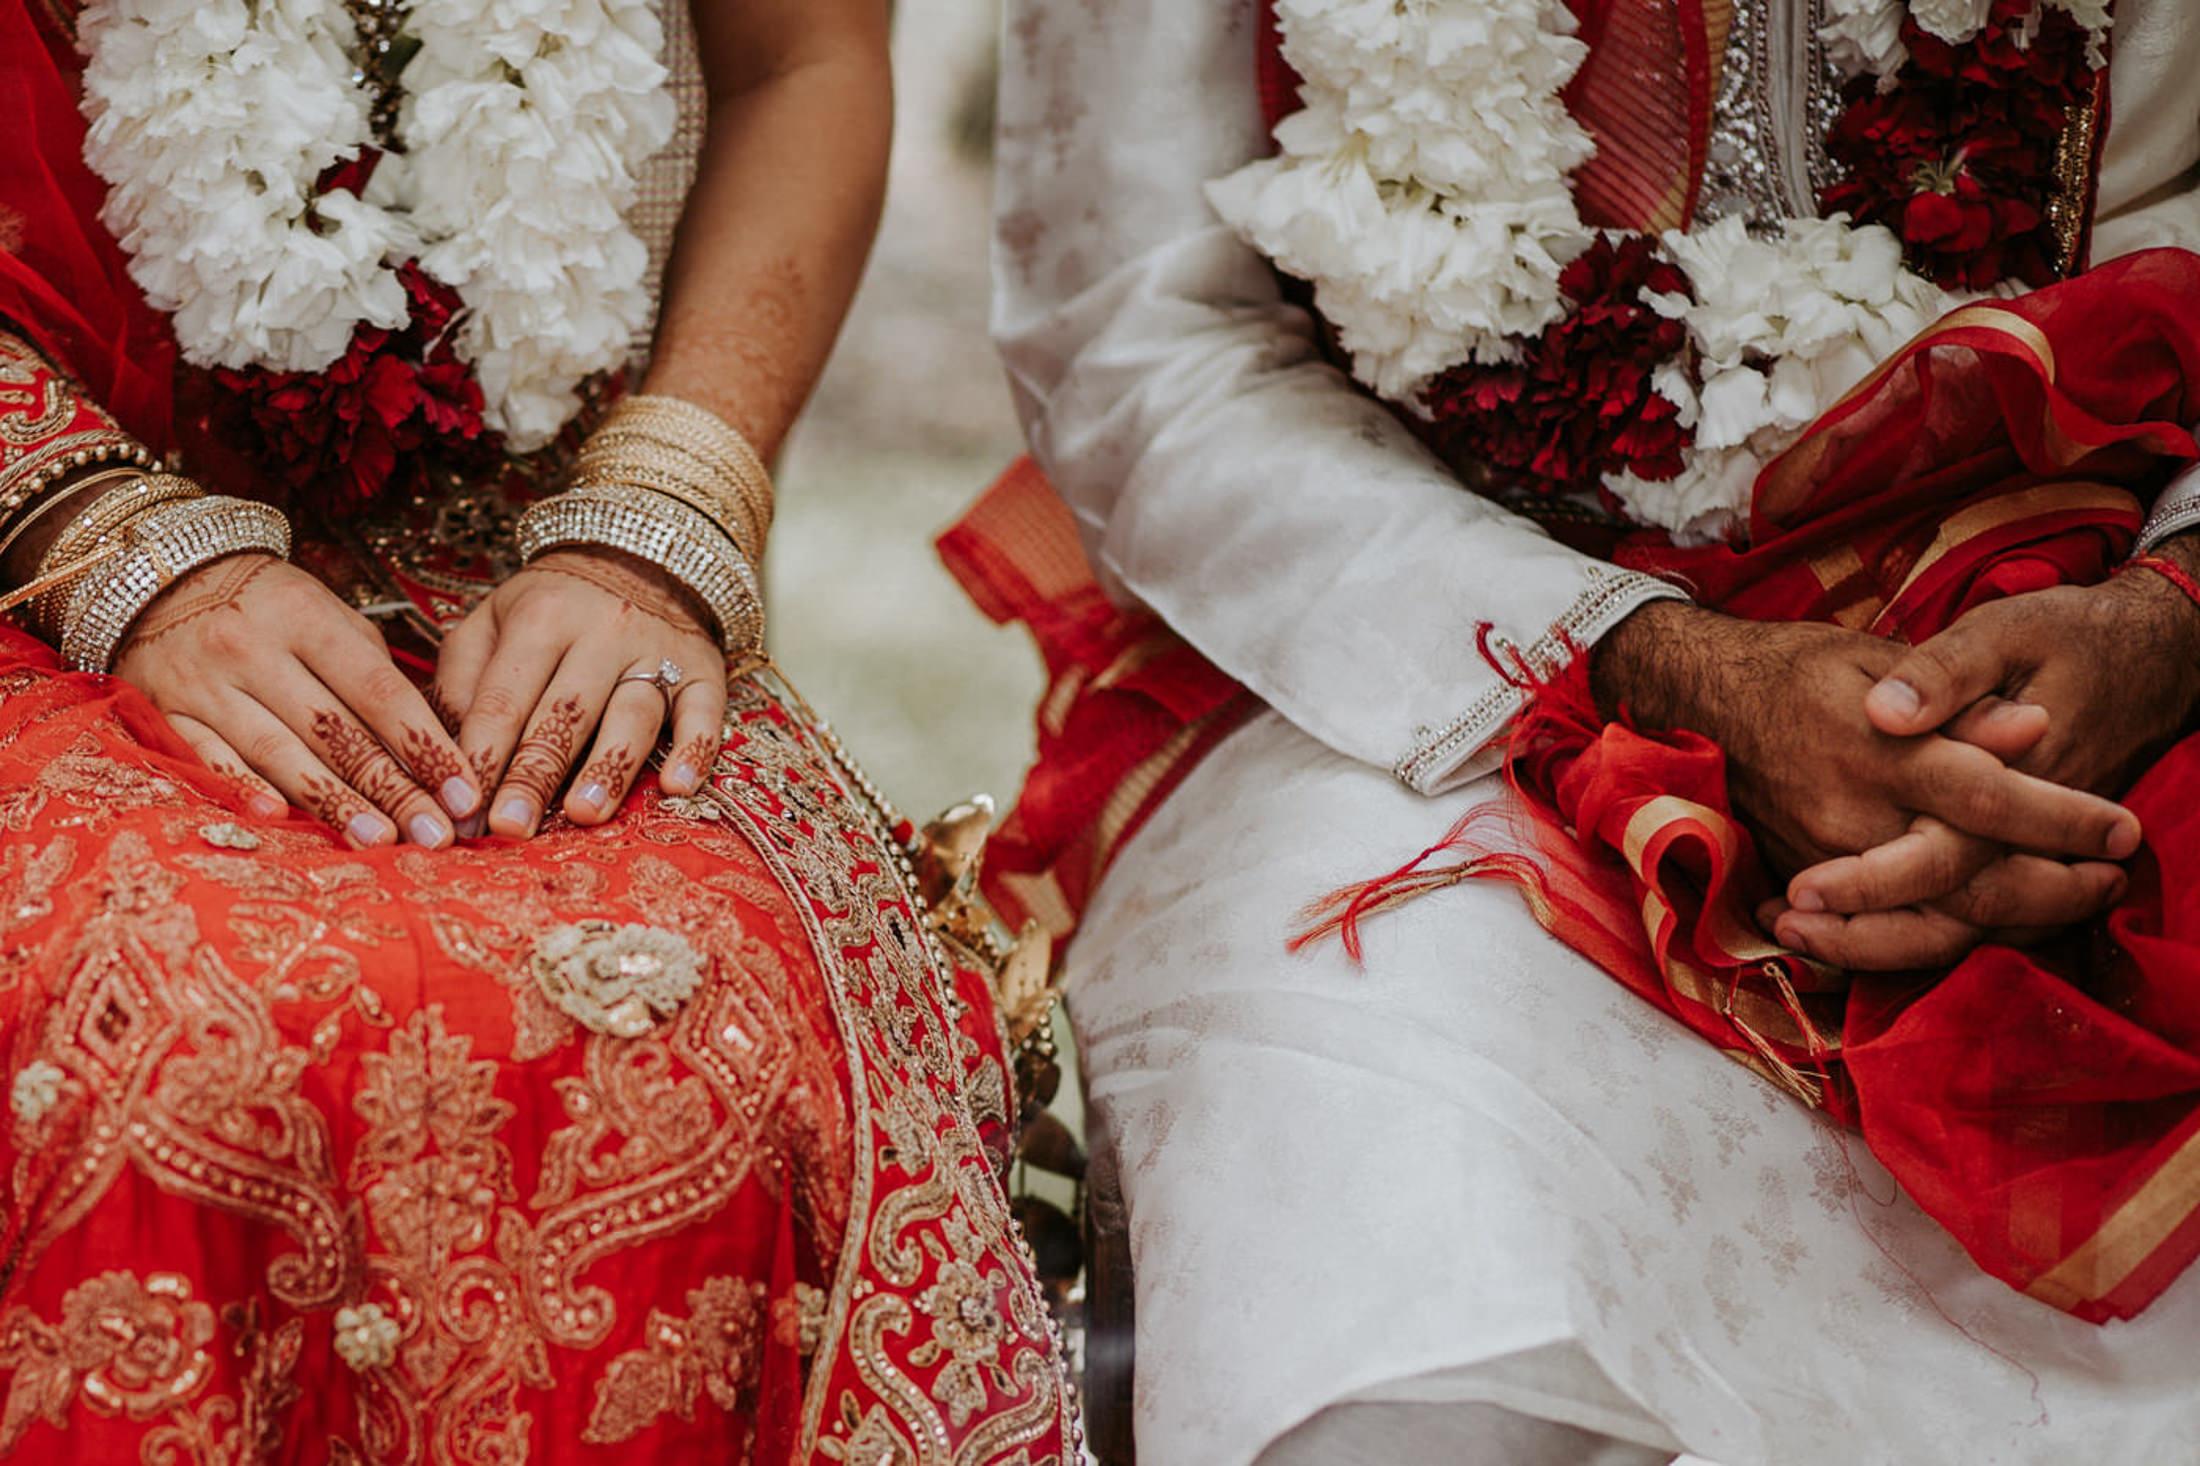 Wedding_Photographer_Mallorca_Daniela-Marquardt_Photography_New_York_Iceland_Tuscany_Santorini_Portugal_Austria_Bavaria_Elopement_Hochzeitsfotograf_AntjeRajat2_47